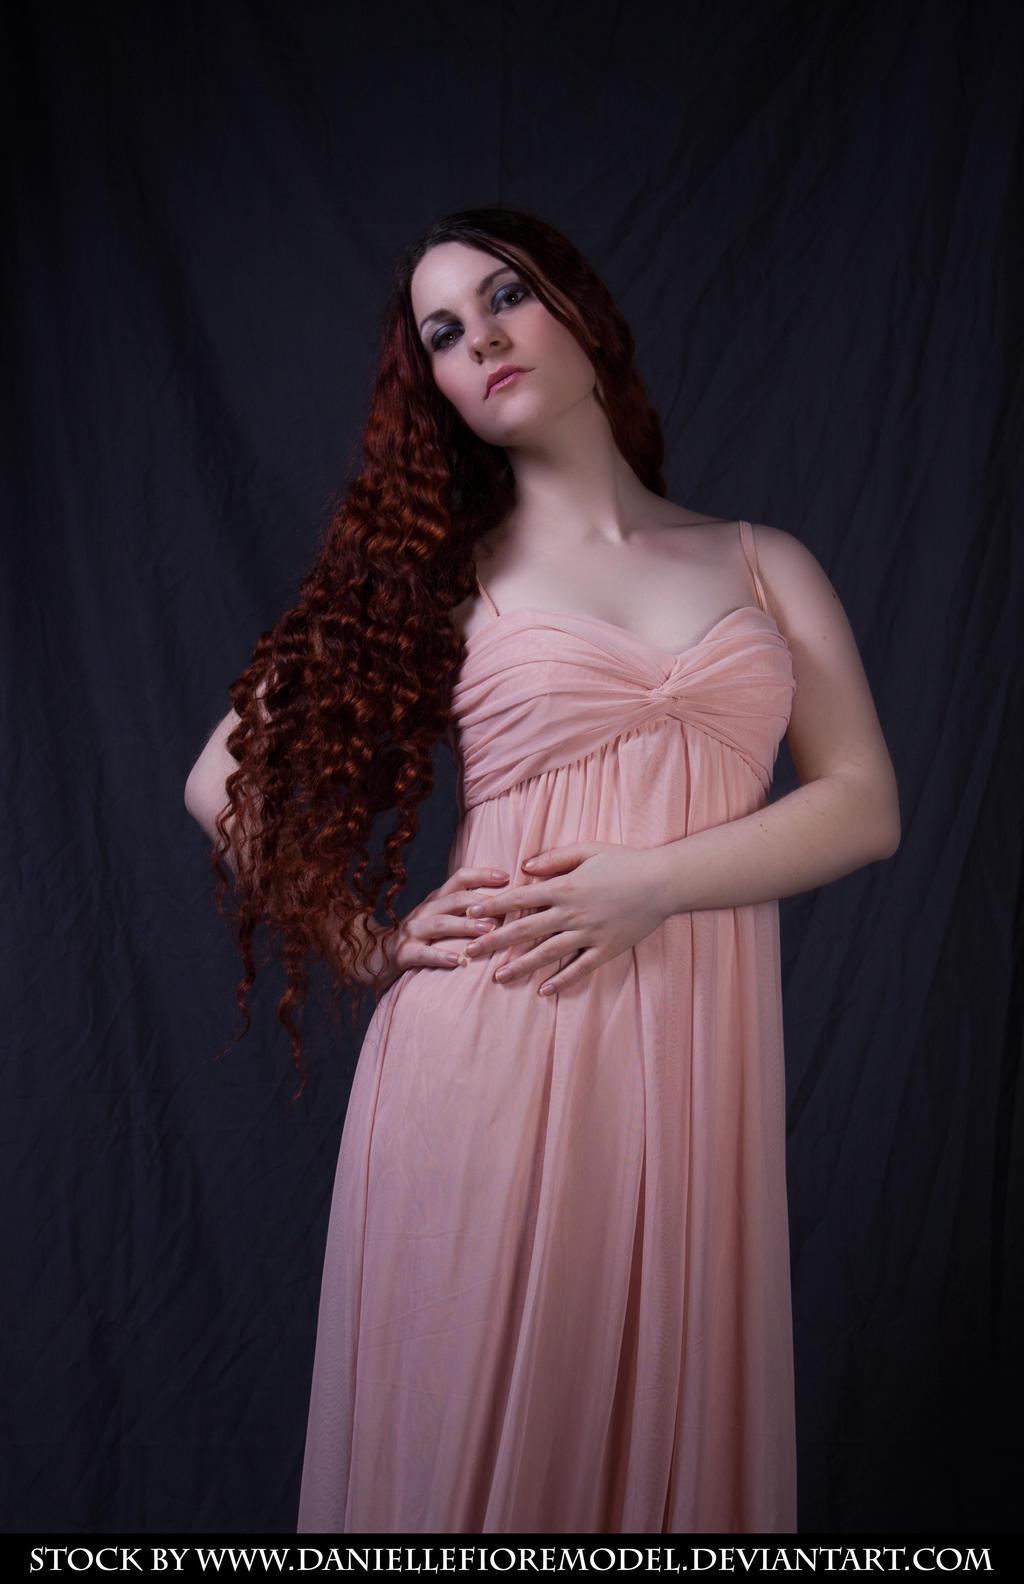 Venus Stock 2 by DanielleFioreModel